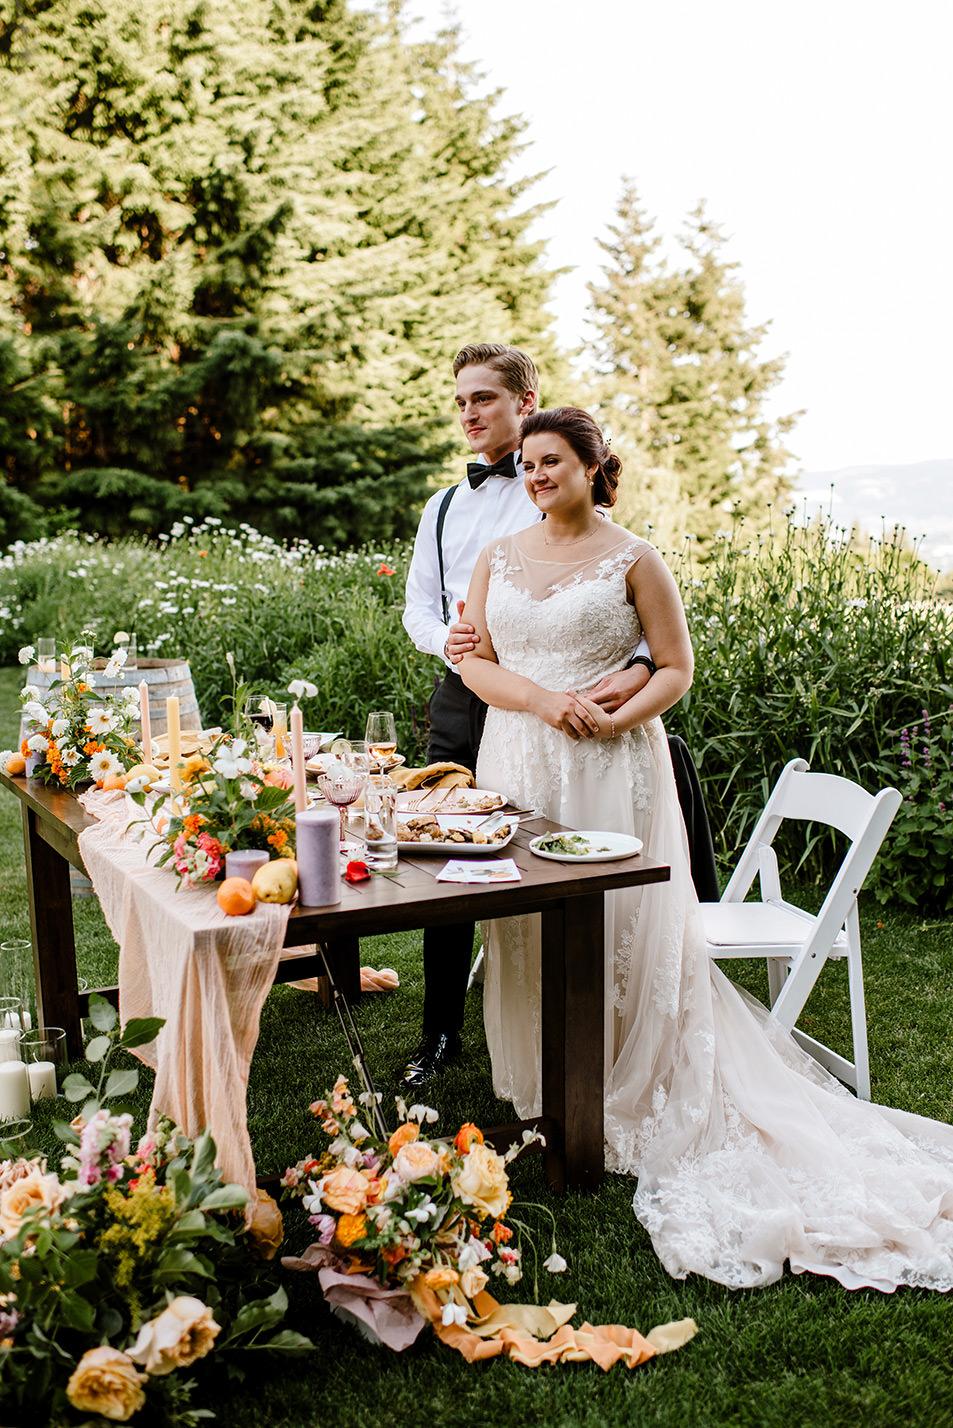 Citrus-inspired-wedding-at-Gorge-Crest-Vineyard-086.jpg